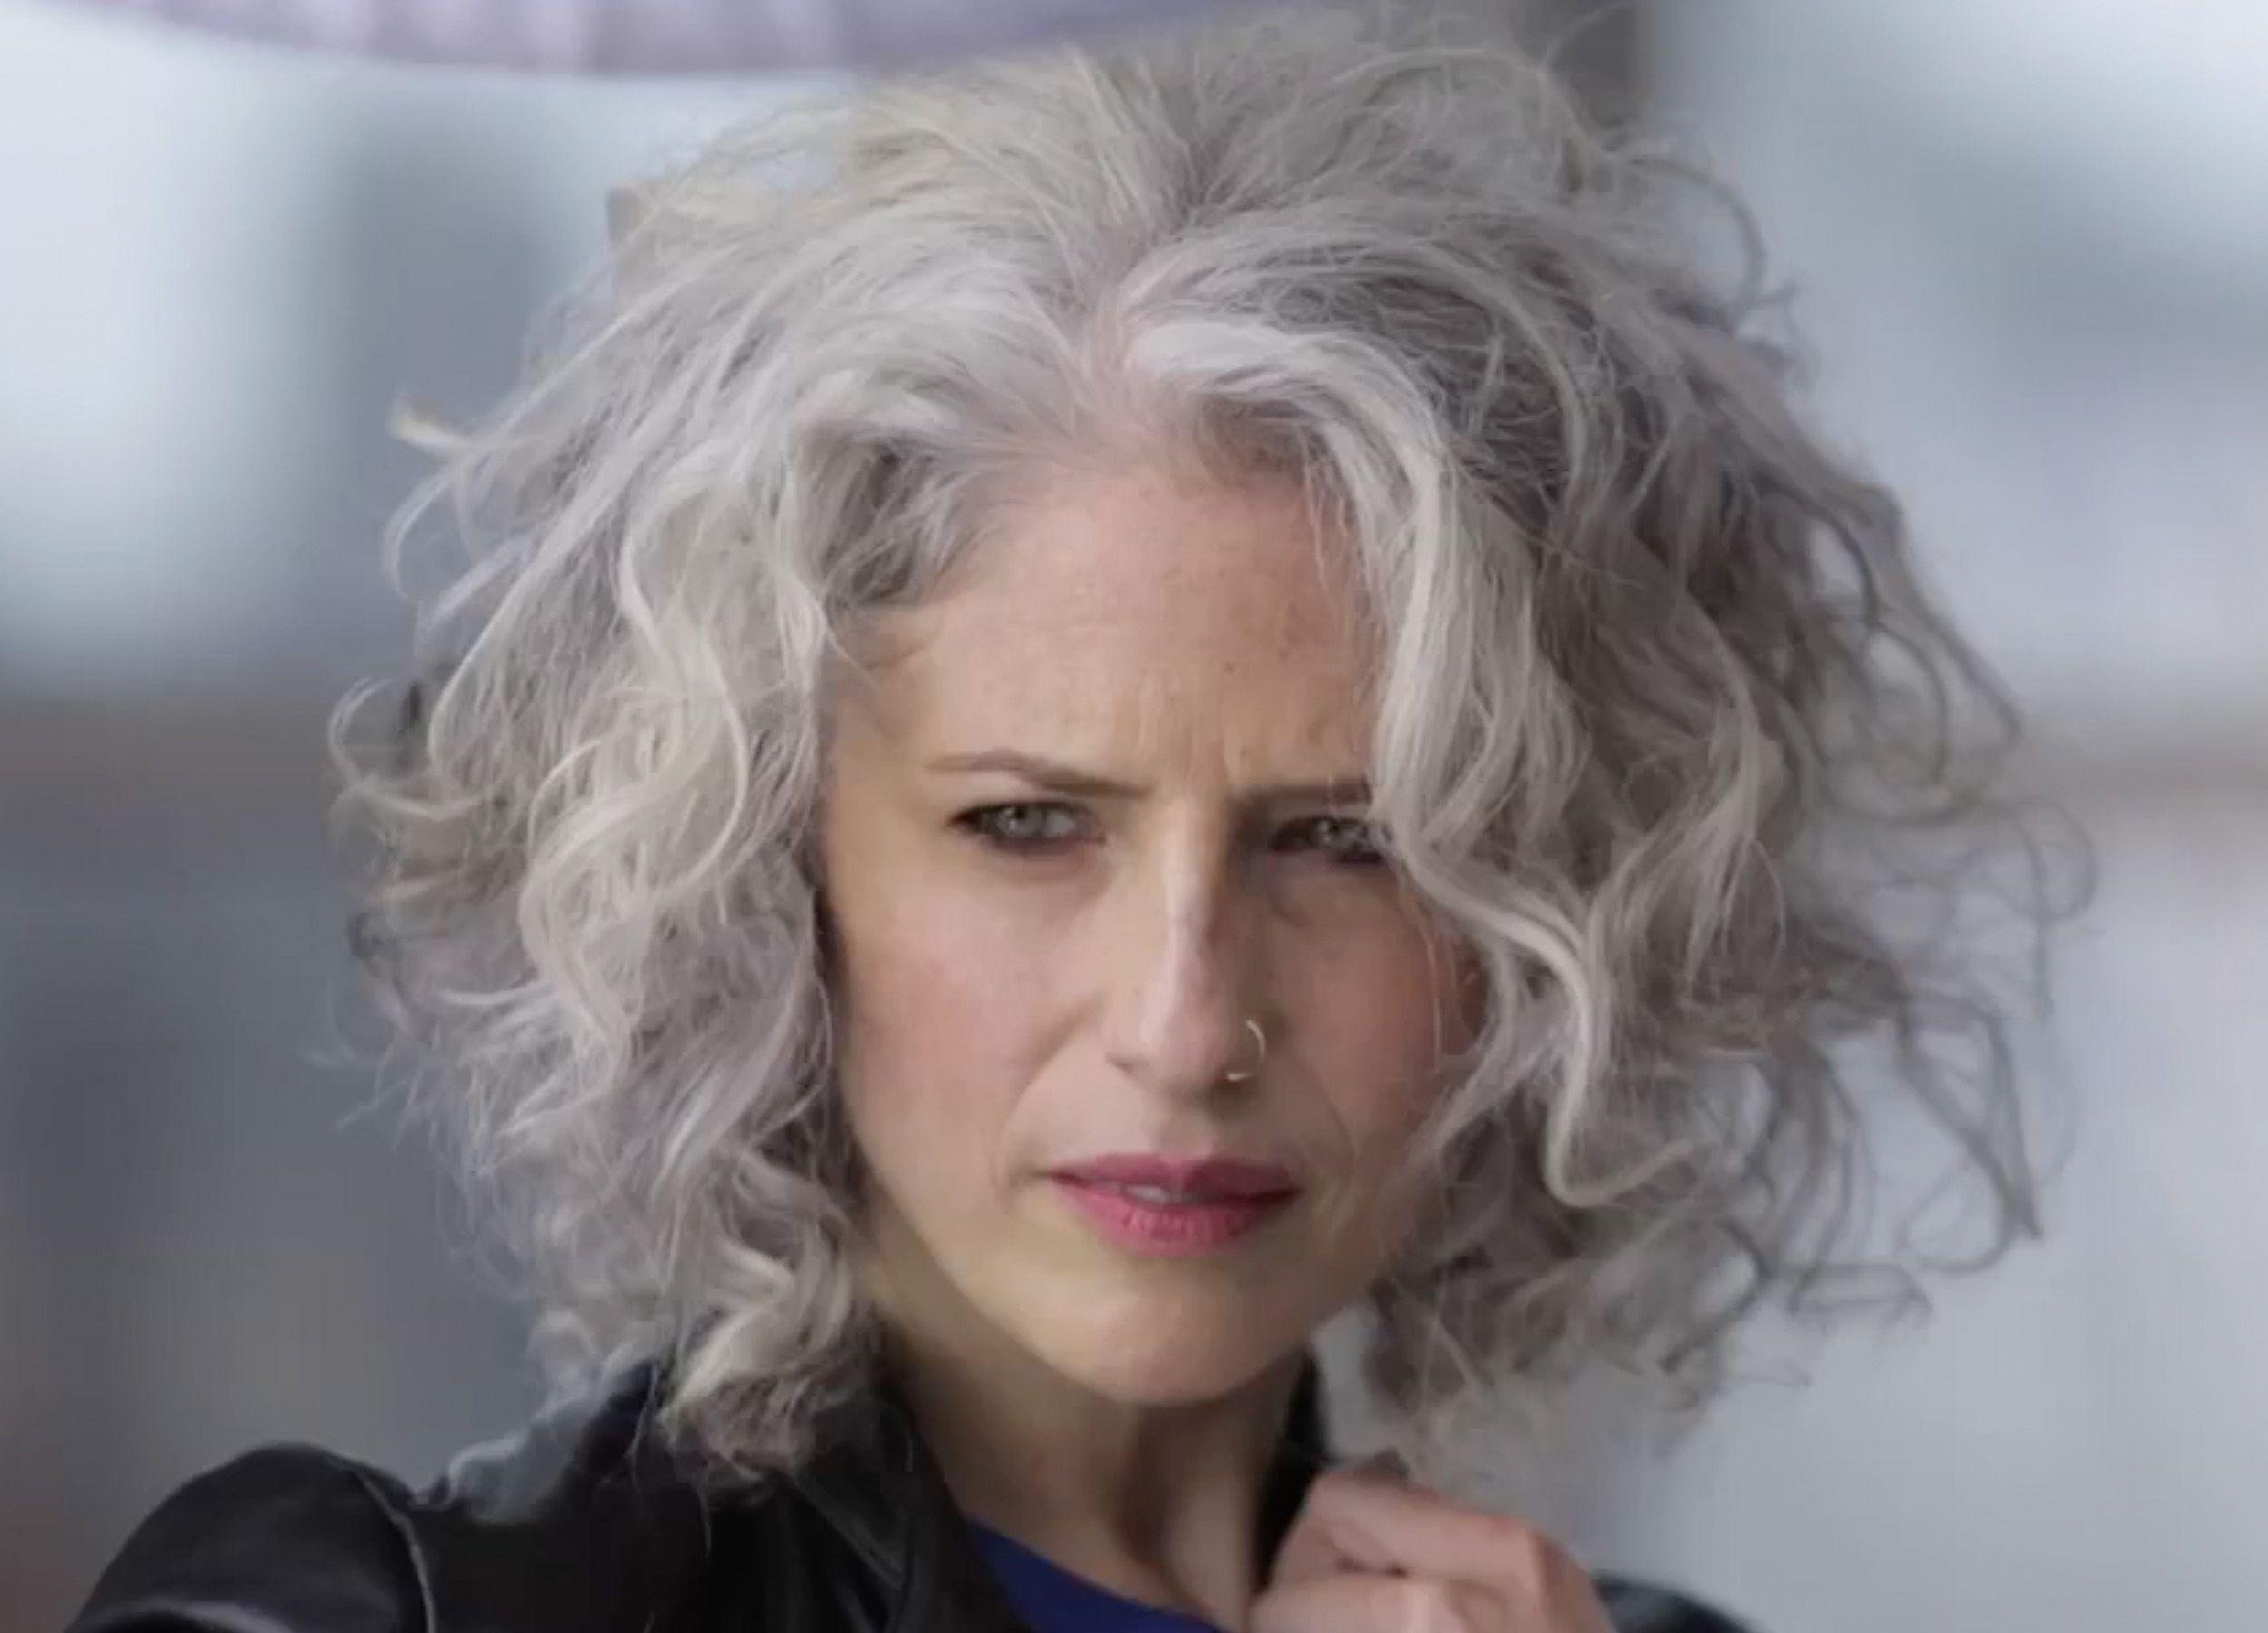 Oh My God This Silver Hair Style Is All My Dreams Come True Soft Curls And Beautiful Kapsels Grijs Krullend Haar Grijs Haar Kapsels Kapsel Voor Krullend Haar